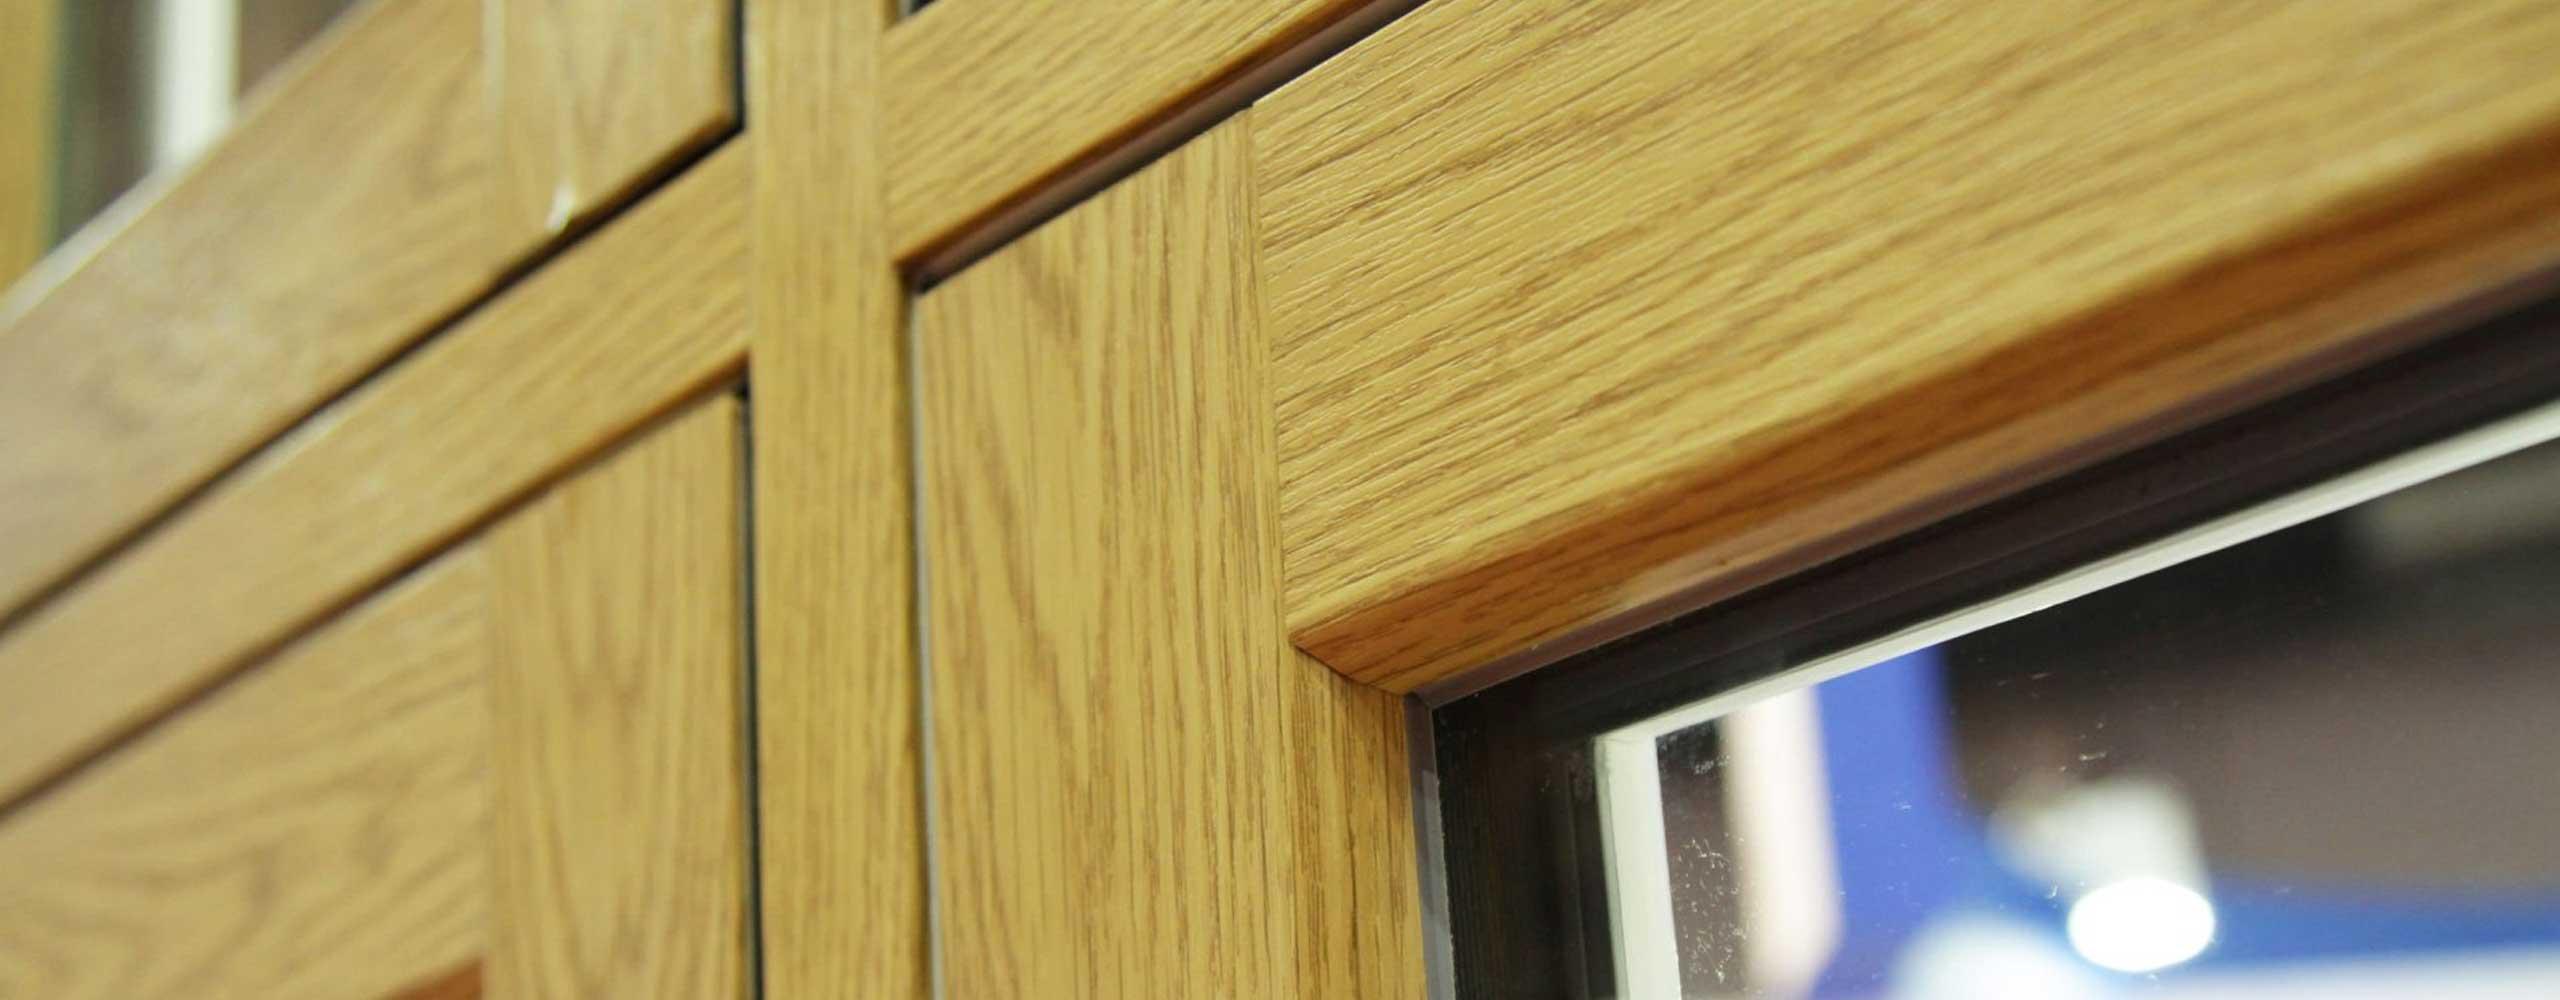 Flush Sash Windows for Homeowners